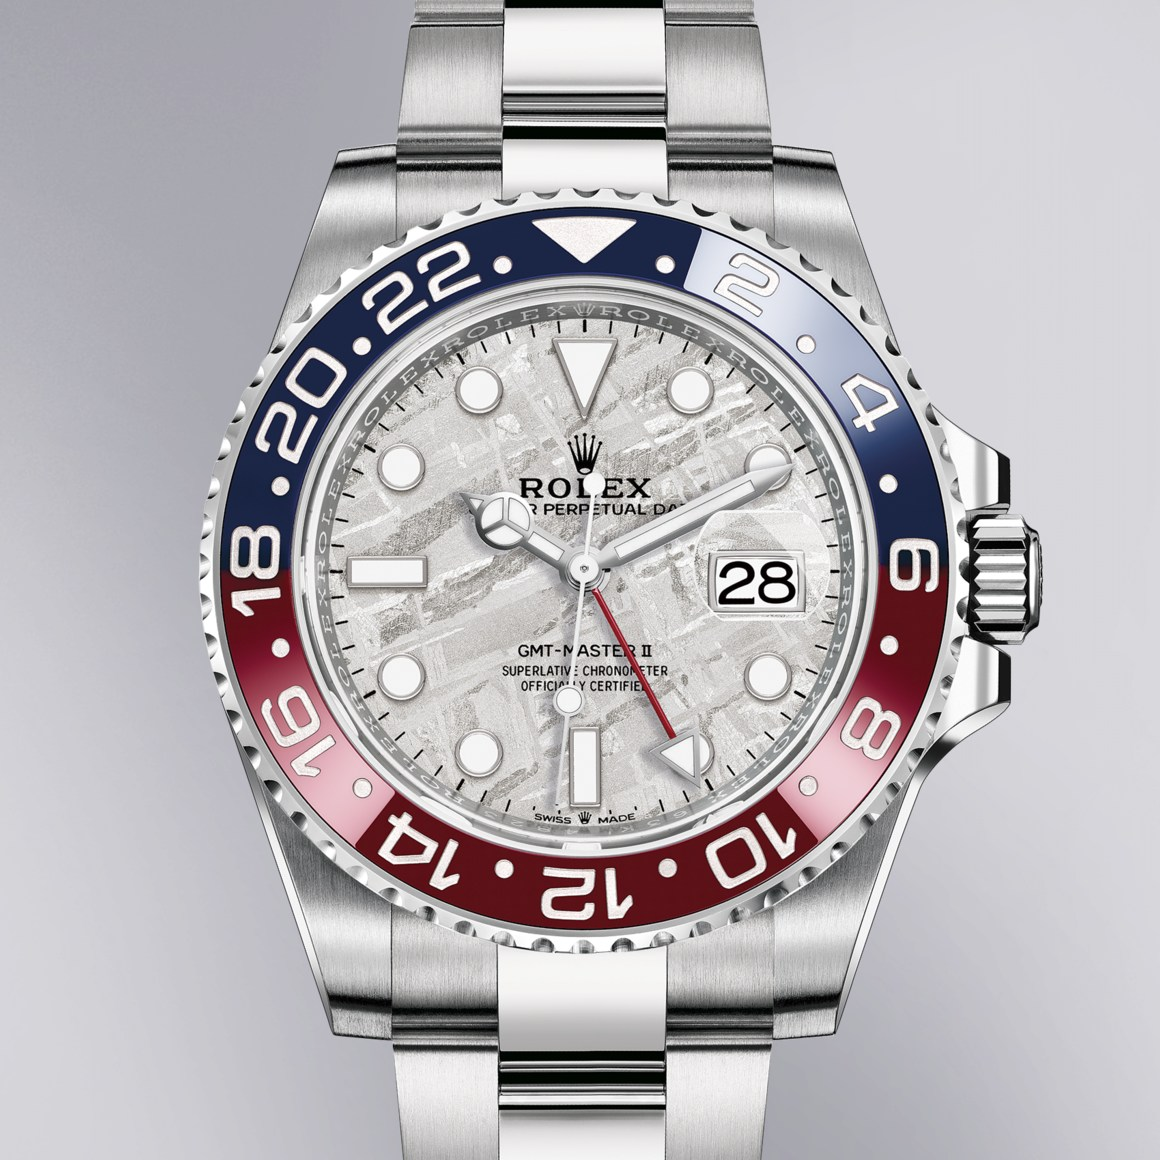 GMT-Master II_m126719blro-0002.png